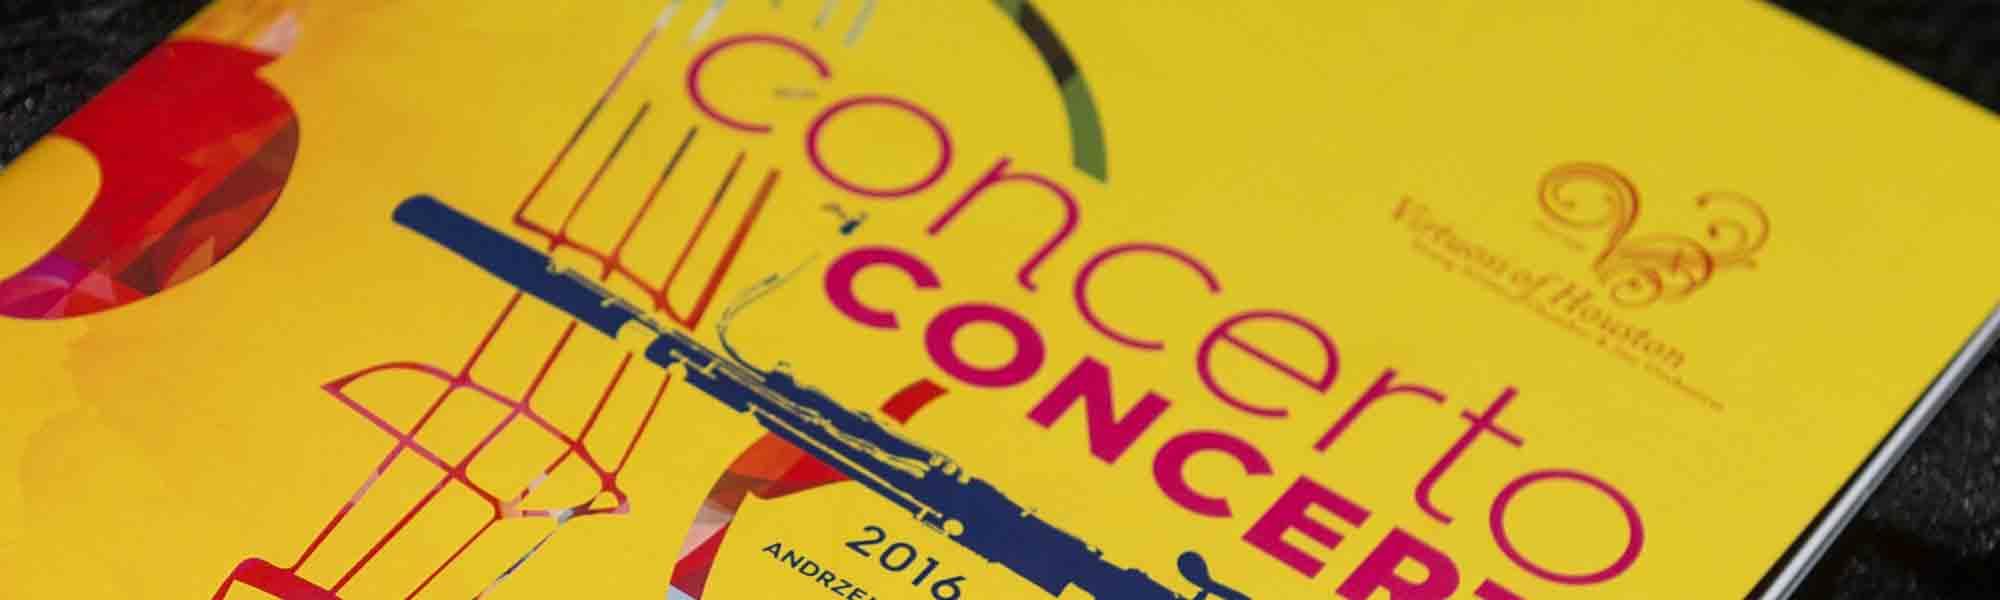 Banner Image for Virtuosi Concerto 2017